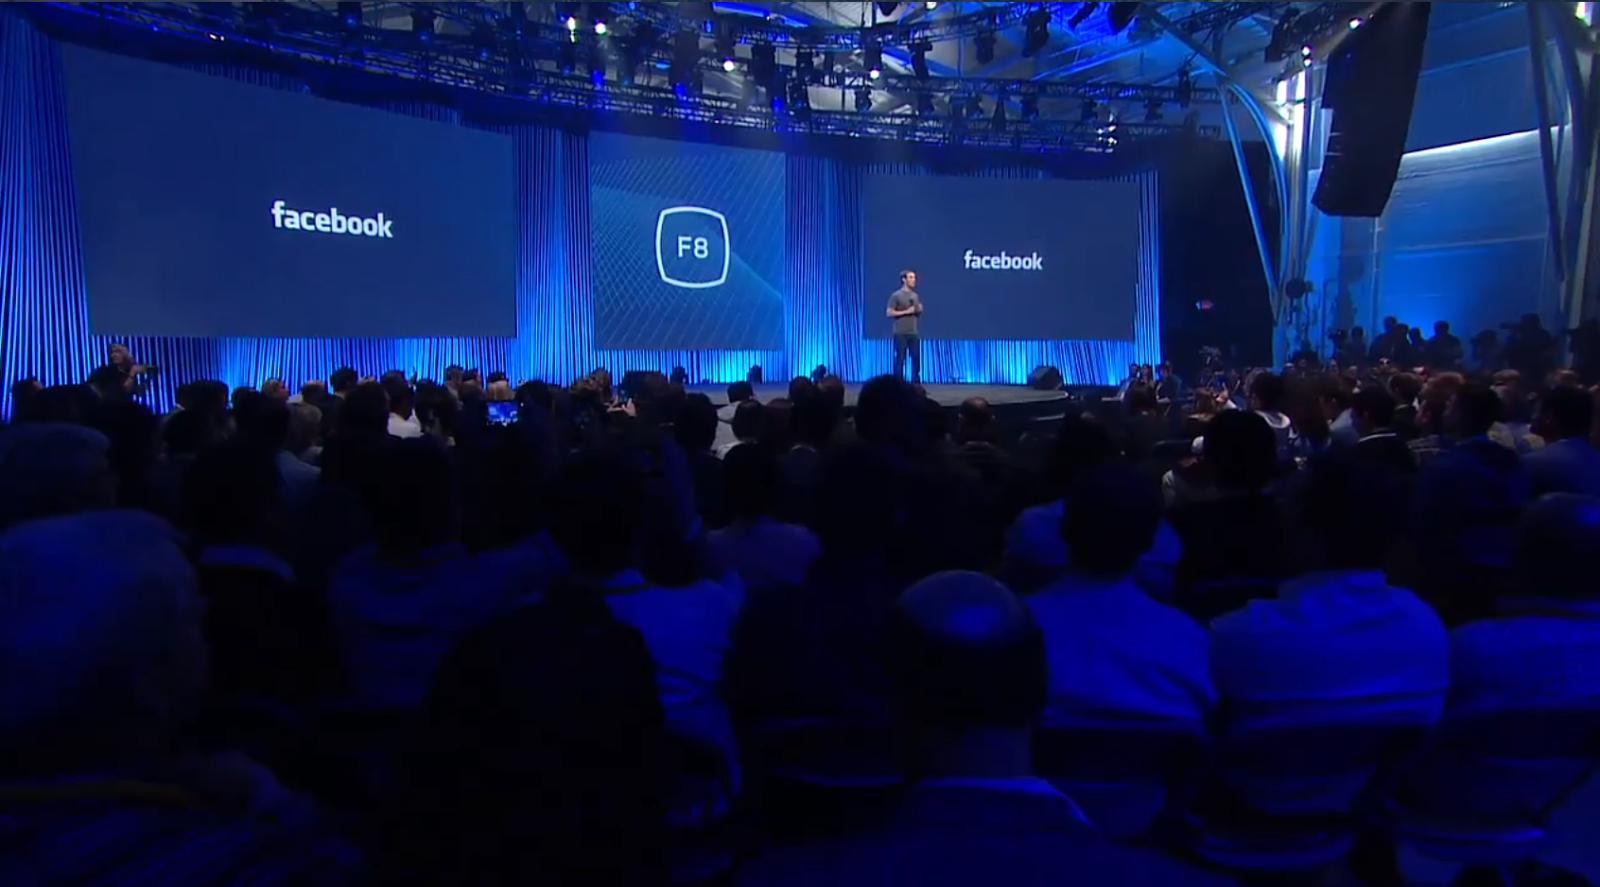 Konference o Facebooku